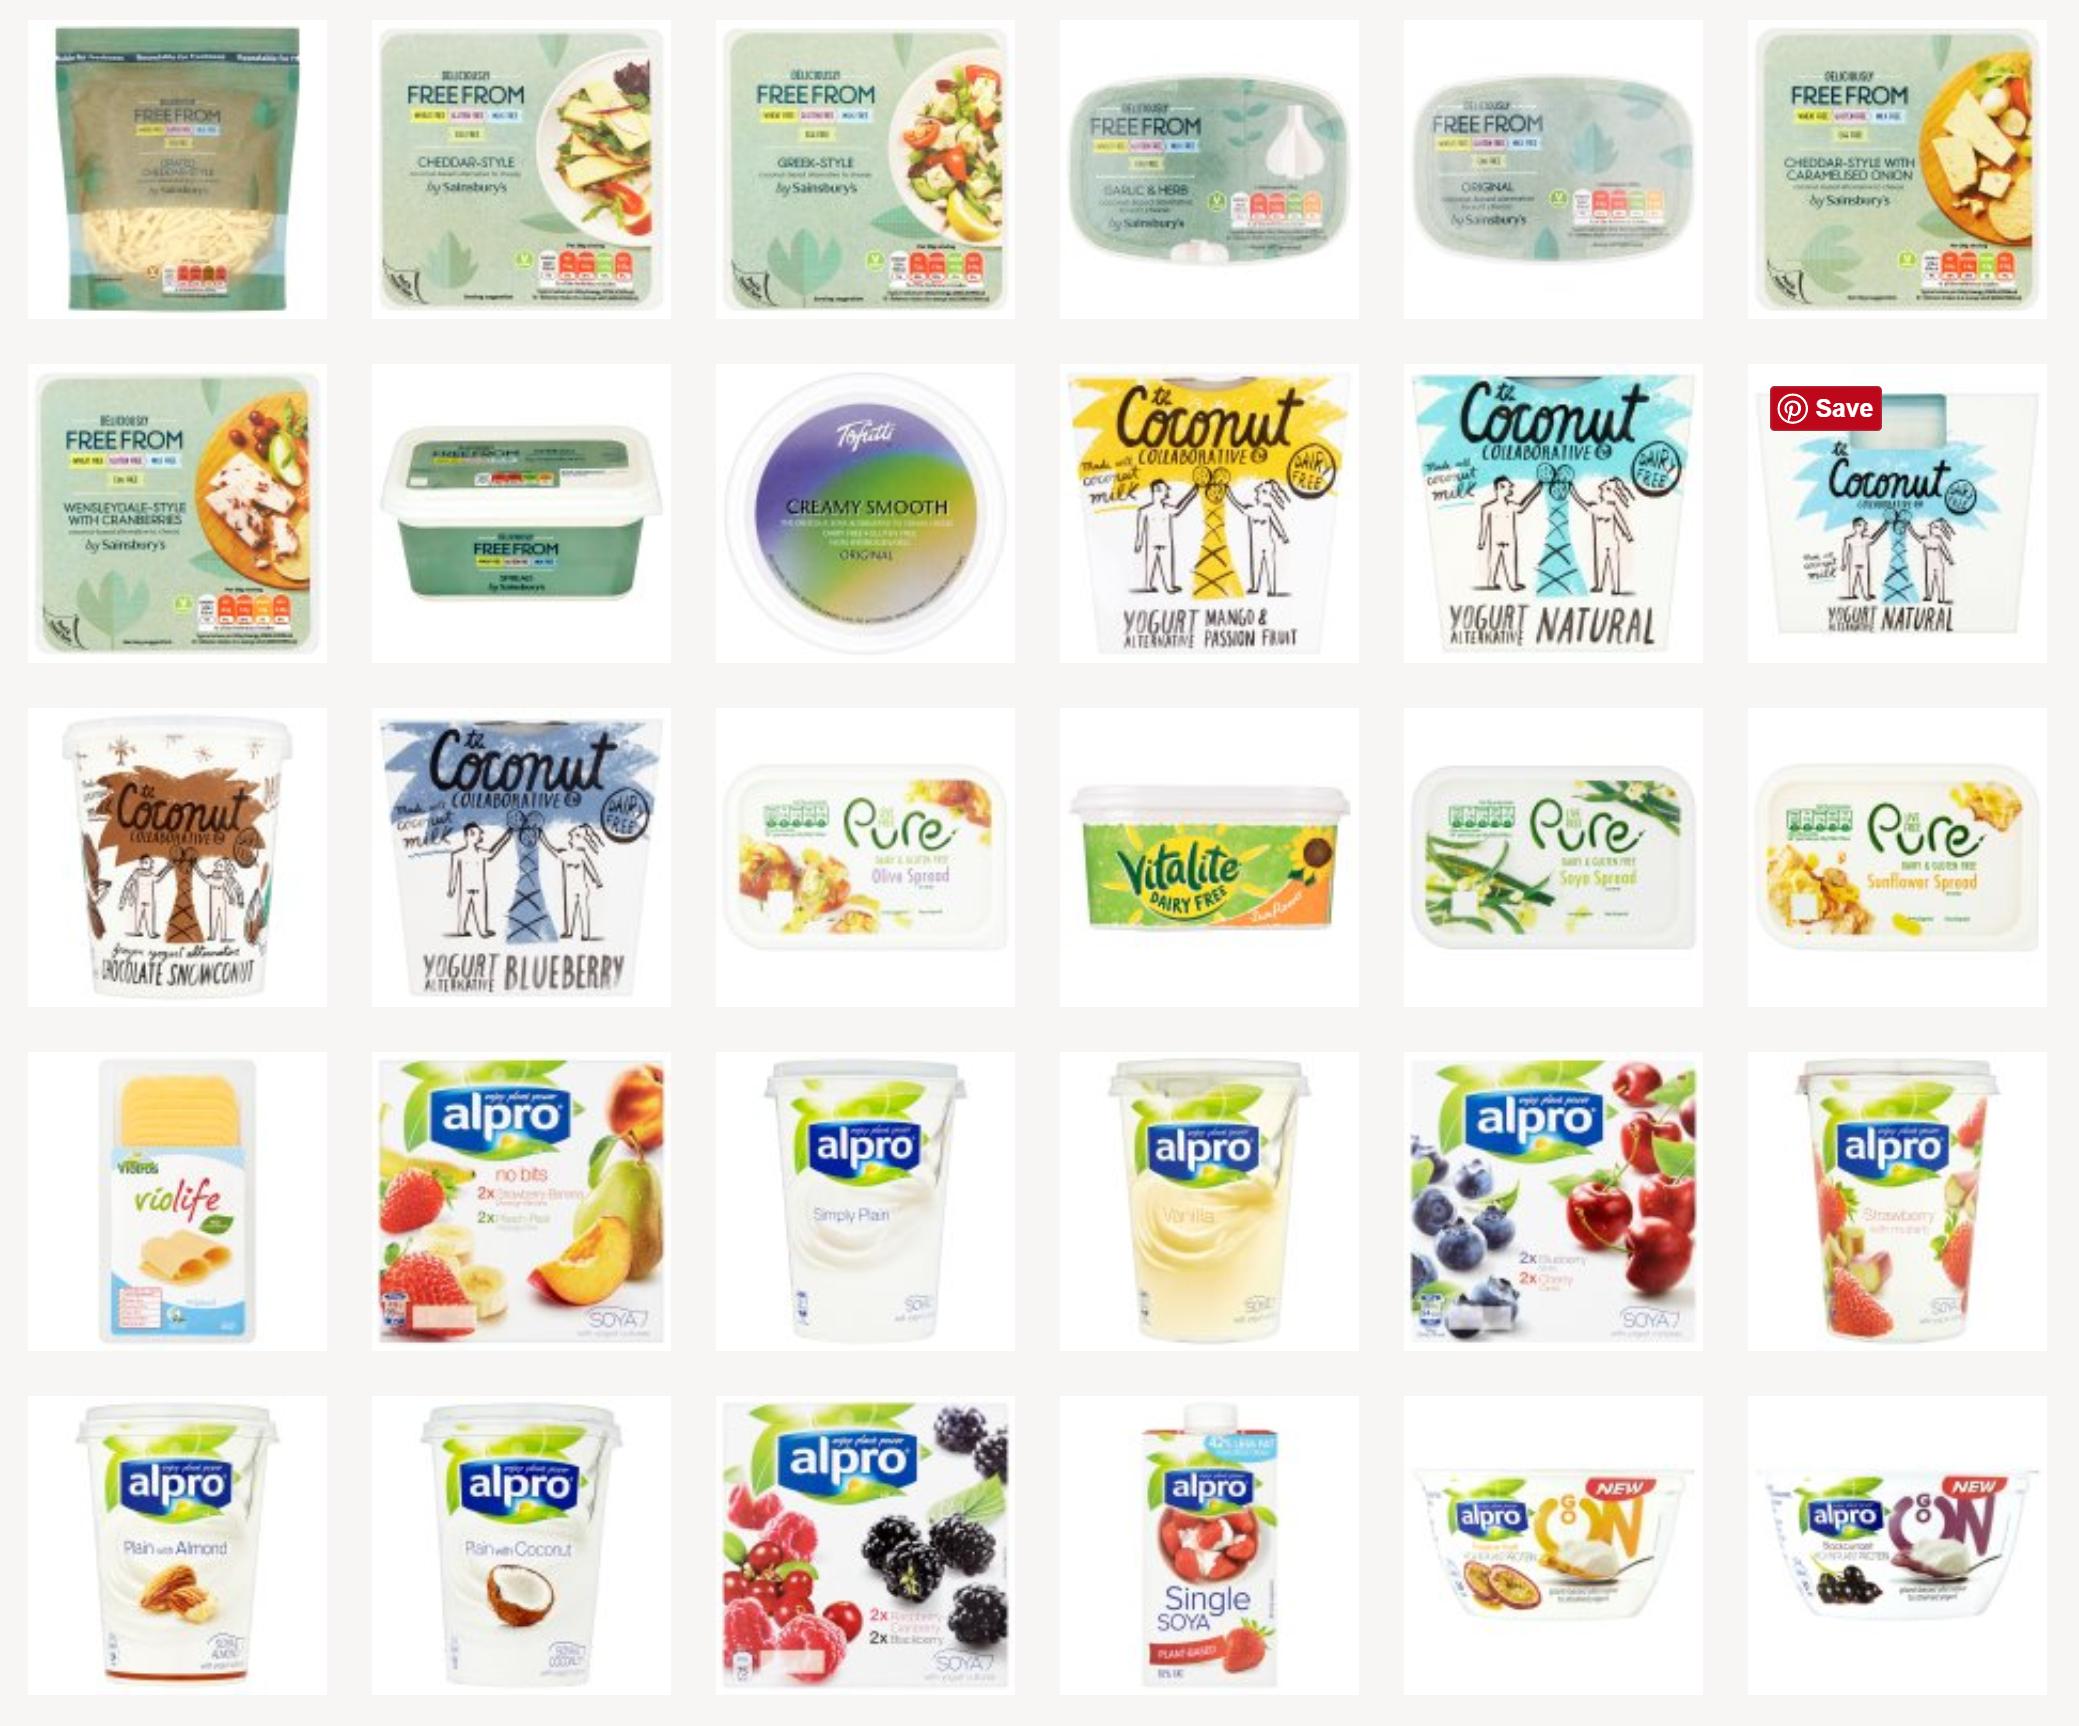 Vegan spreads, cheese and yoghurt in Sainsbury's